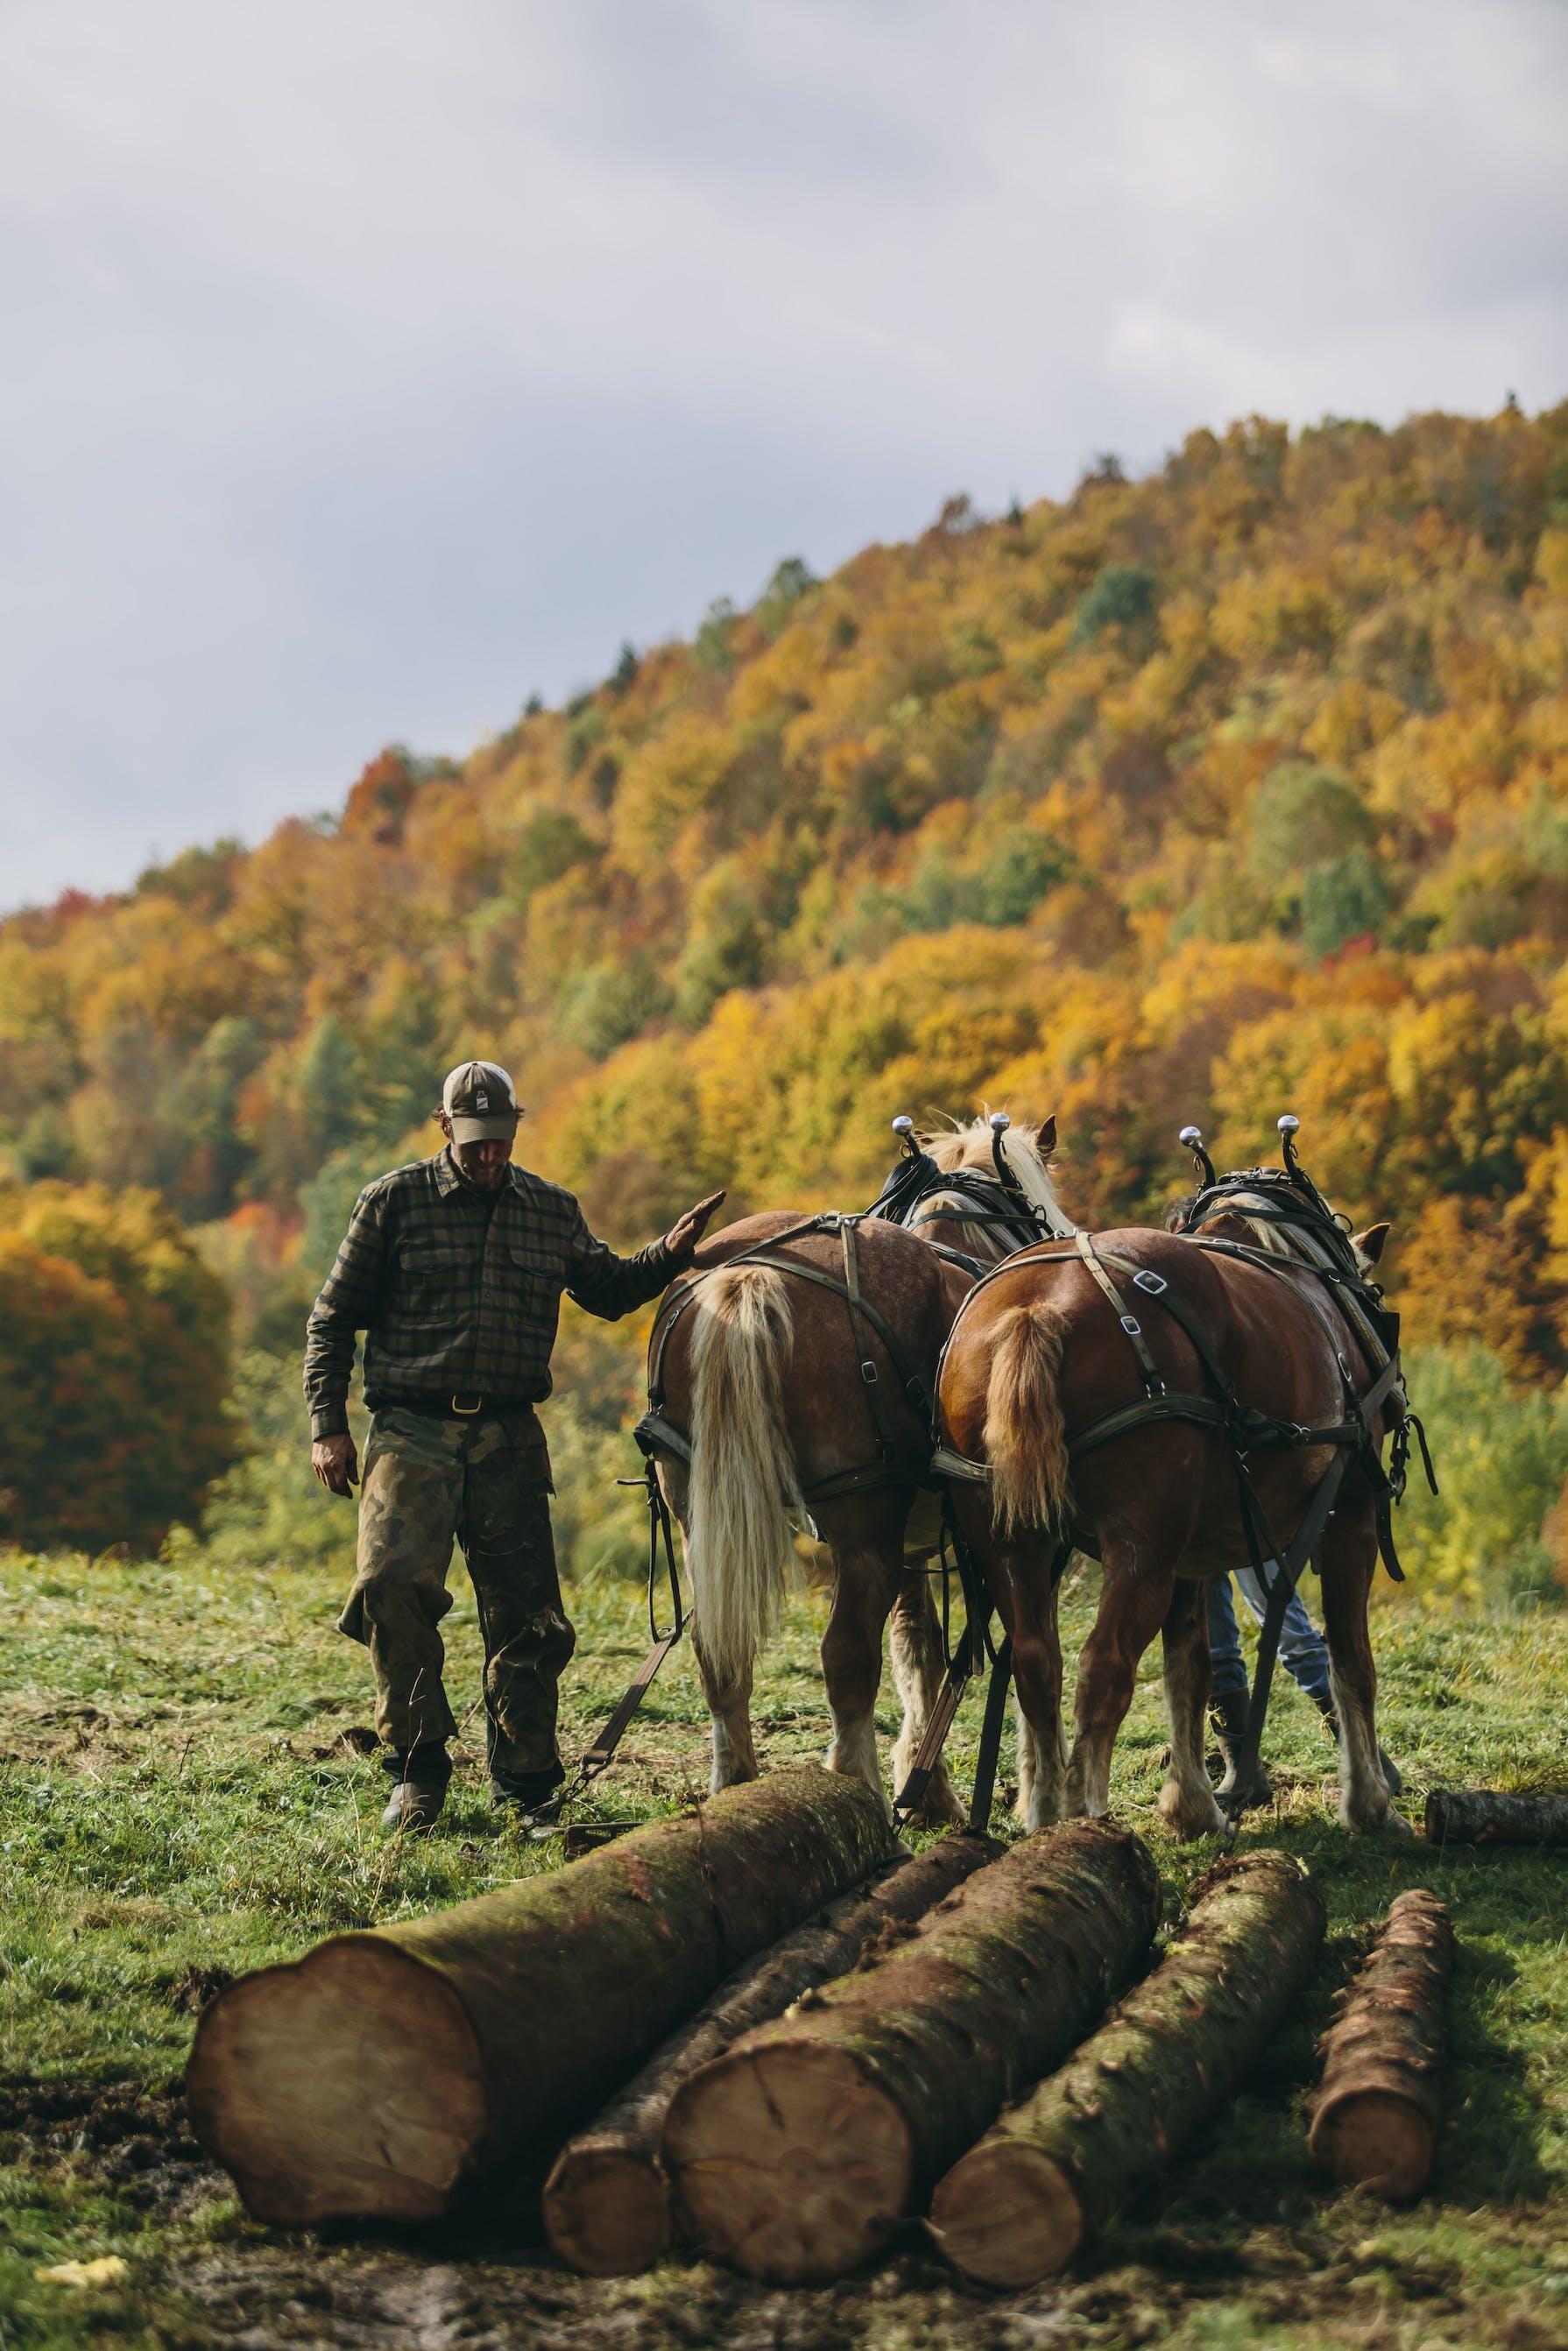 Horse Logging Vermont S Northeast Kingdom The Filson Journal